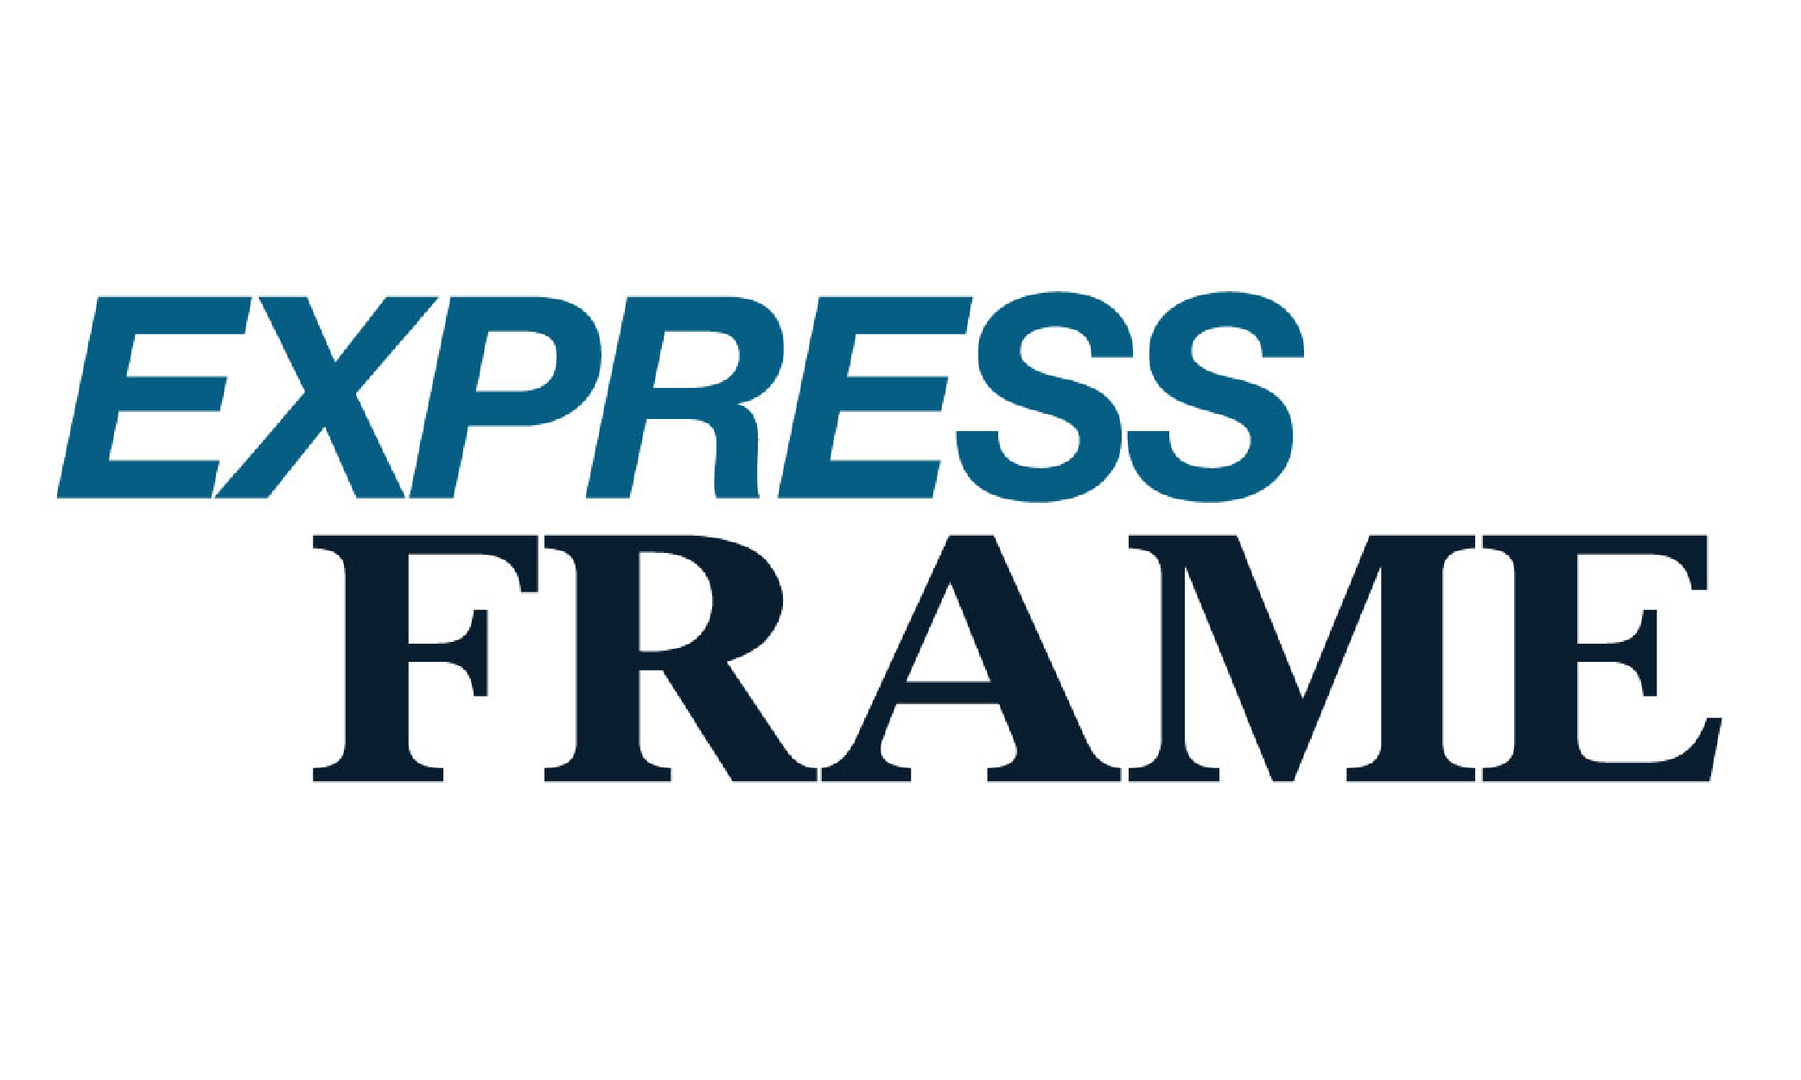 expressframe-01.png